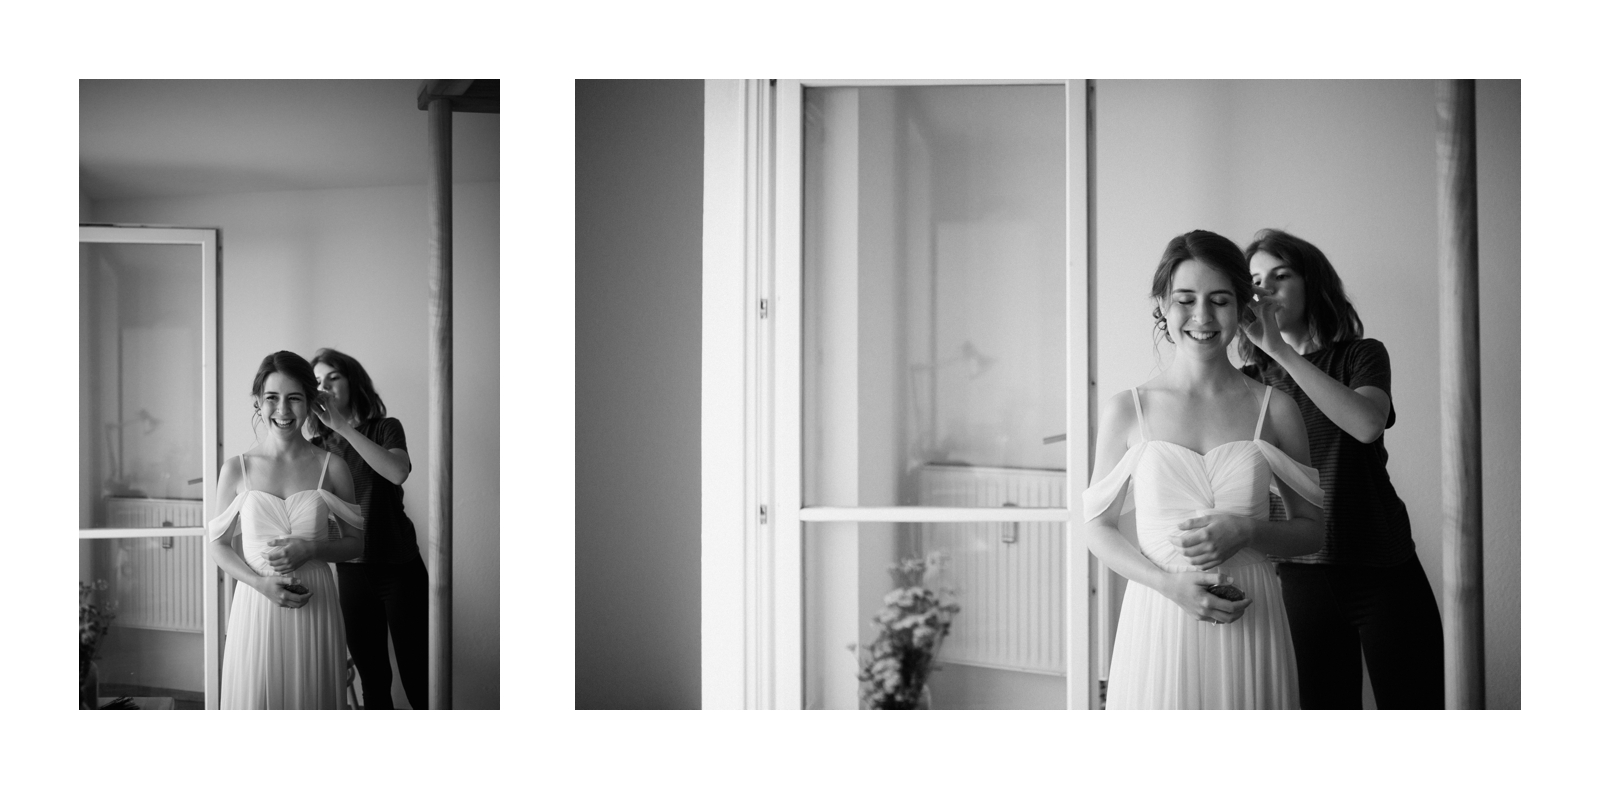 mirjam_thomas_wedding-63-2.jpg